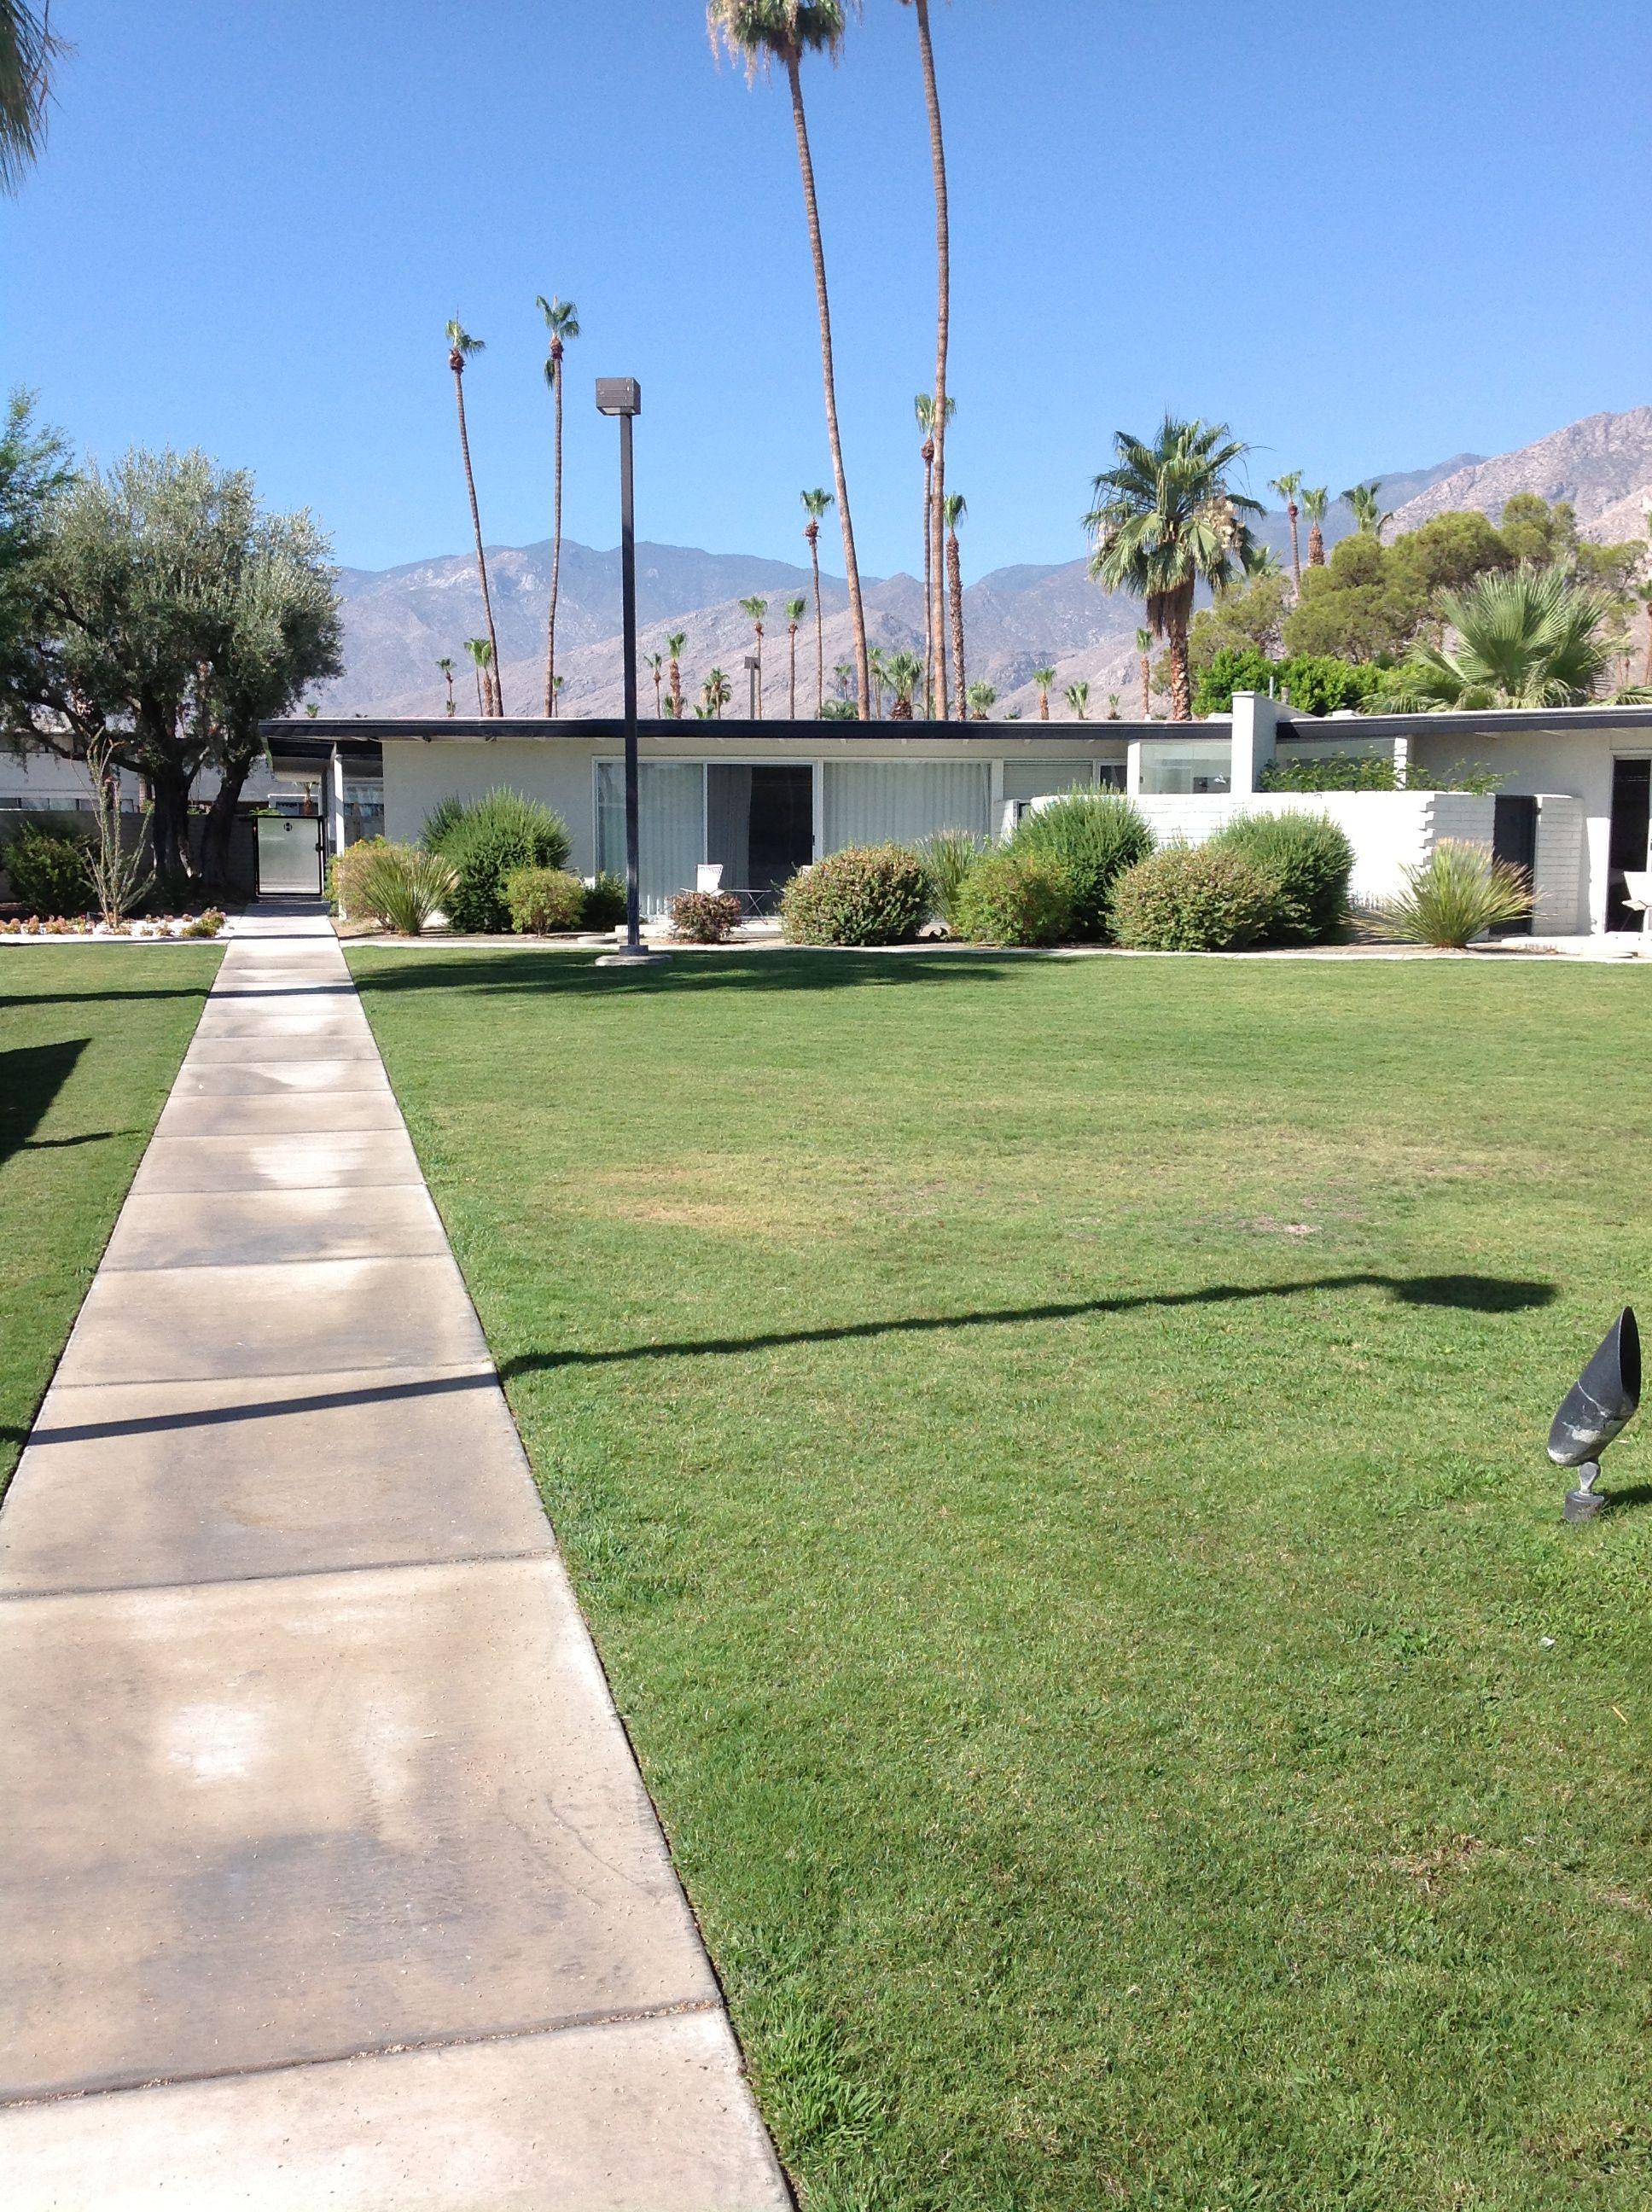 The Horizon hotel, Palm Springs